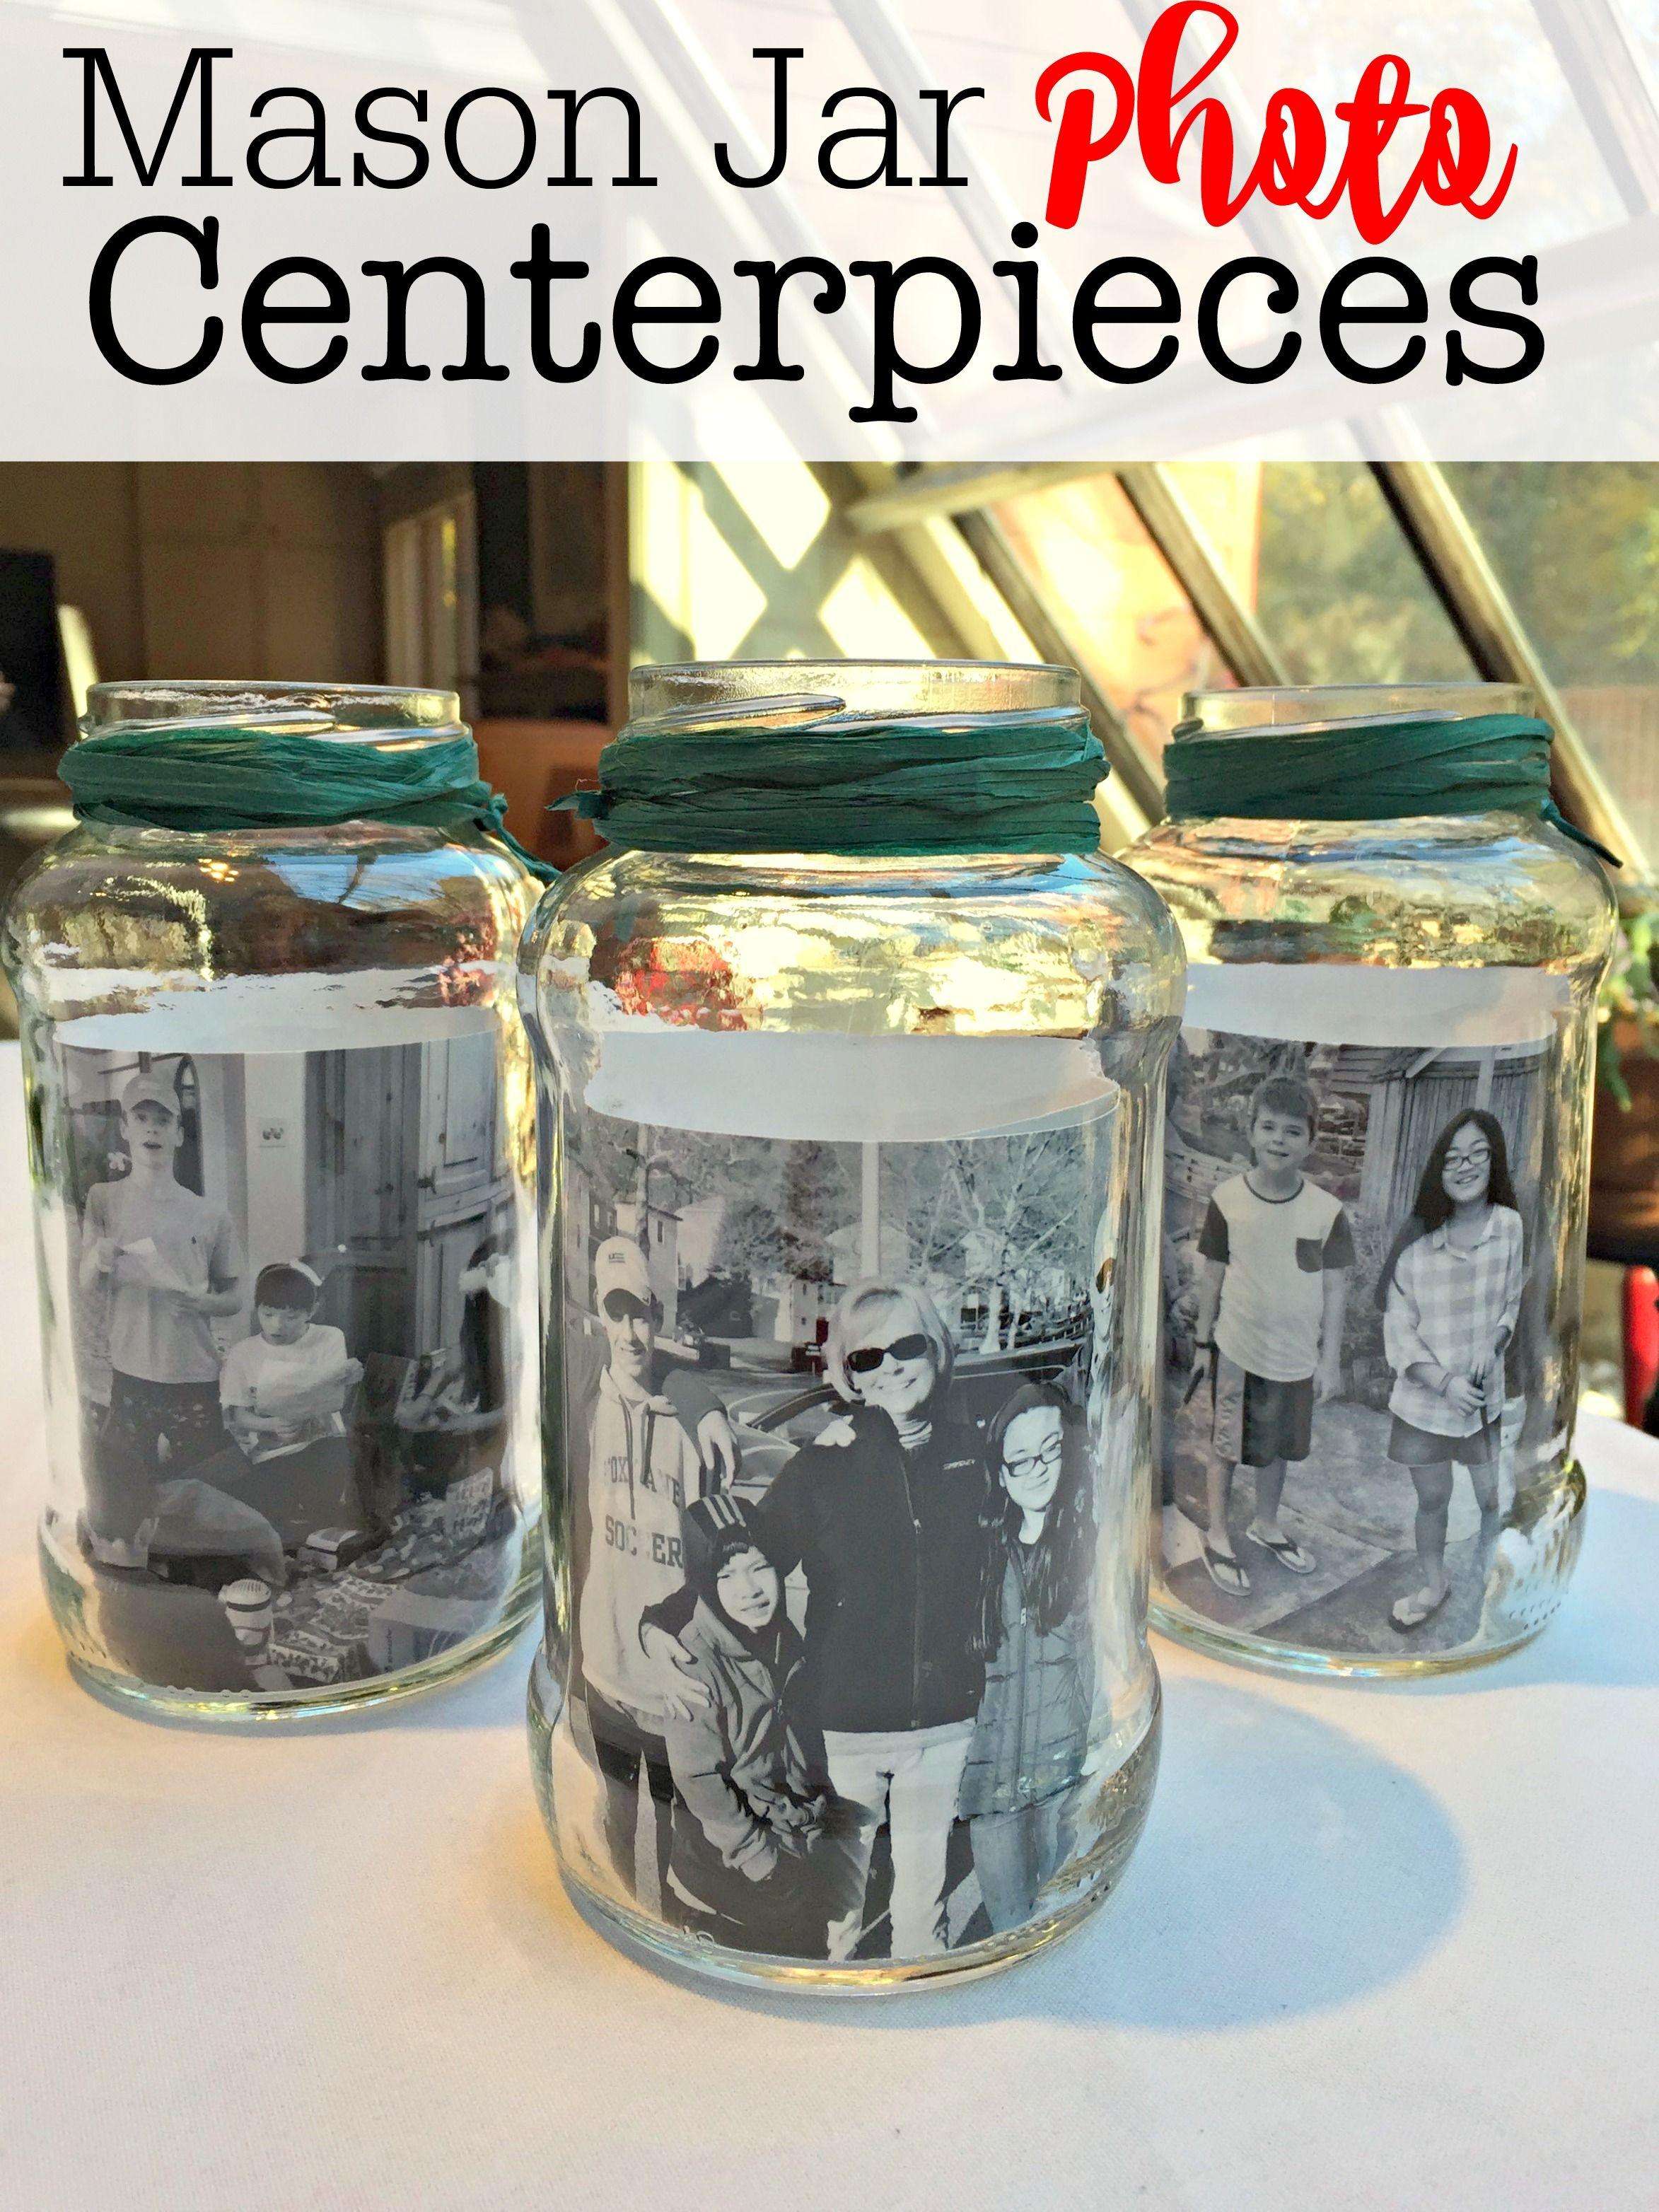 Mason jar photo centerpieces photo centerpieces mason jar photo